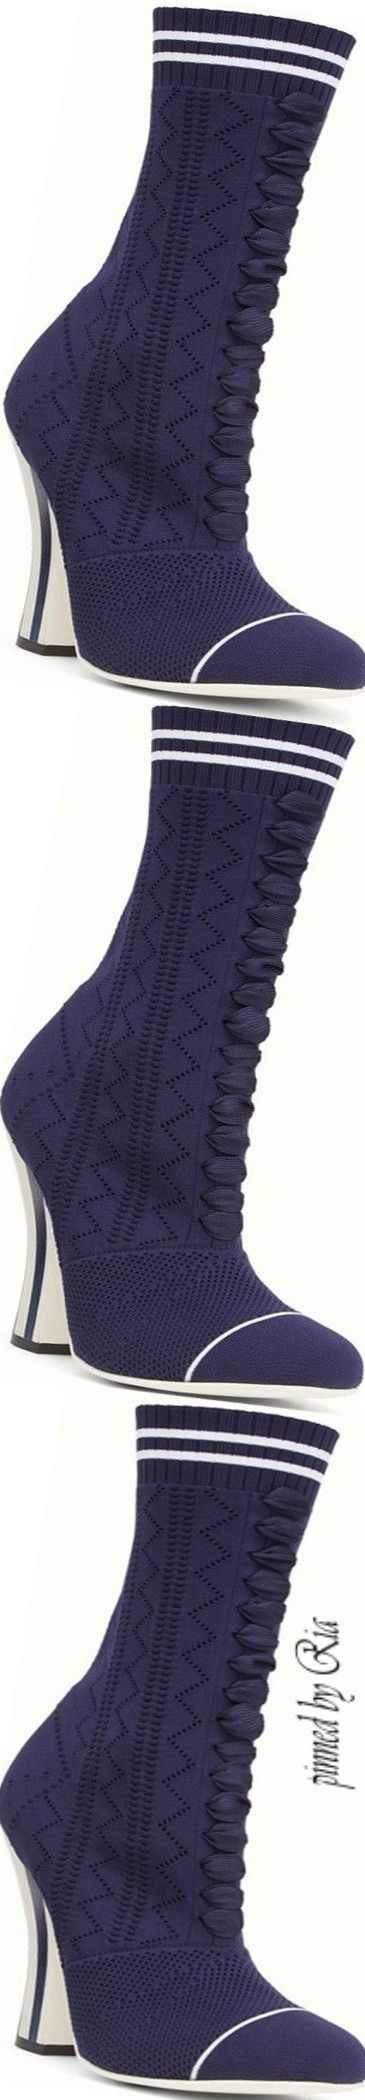 Fendi Navy Blue Fabric Boot l Ria